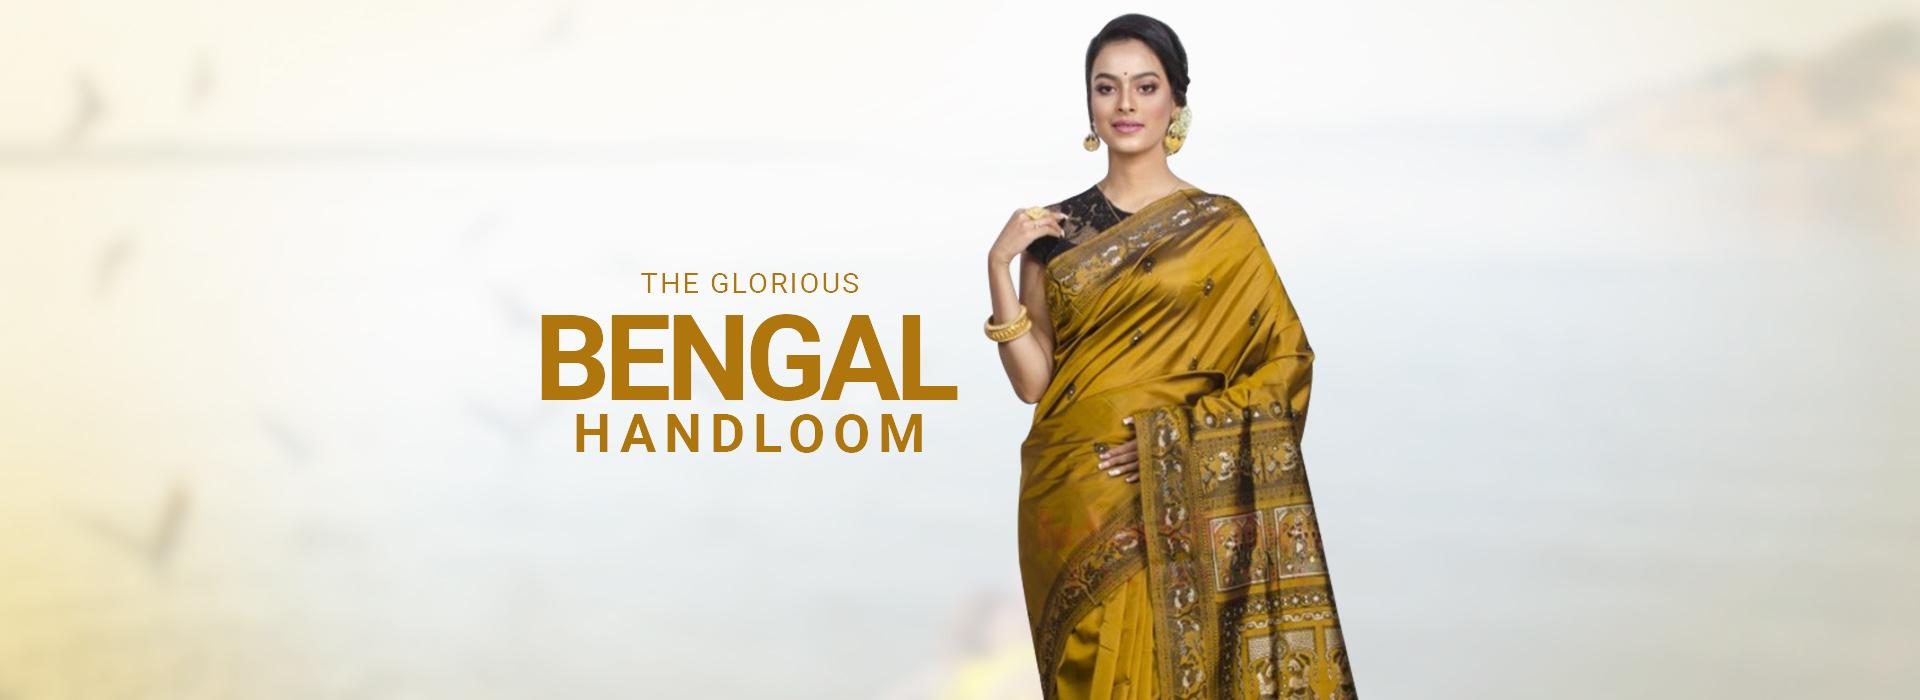 The Glorious Bengal Handloom